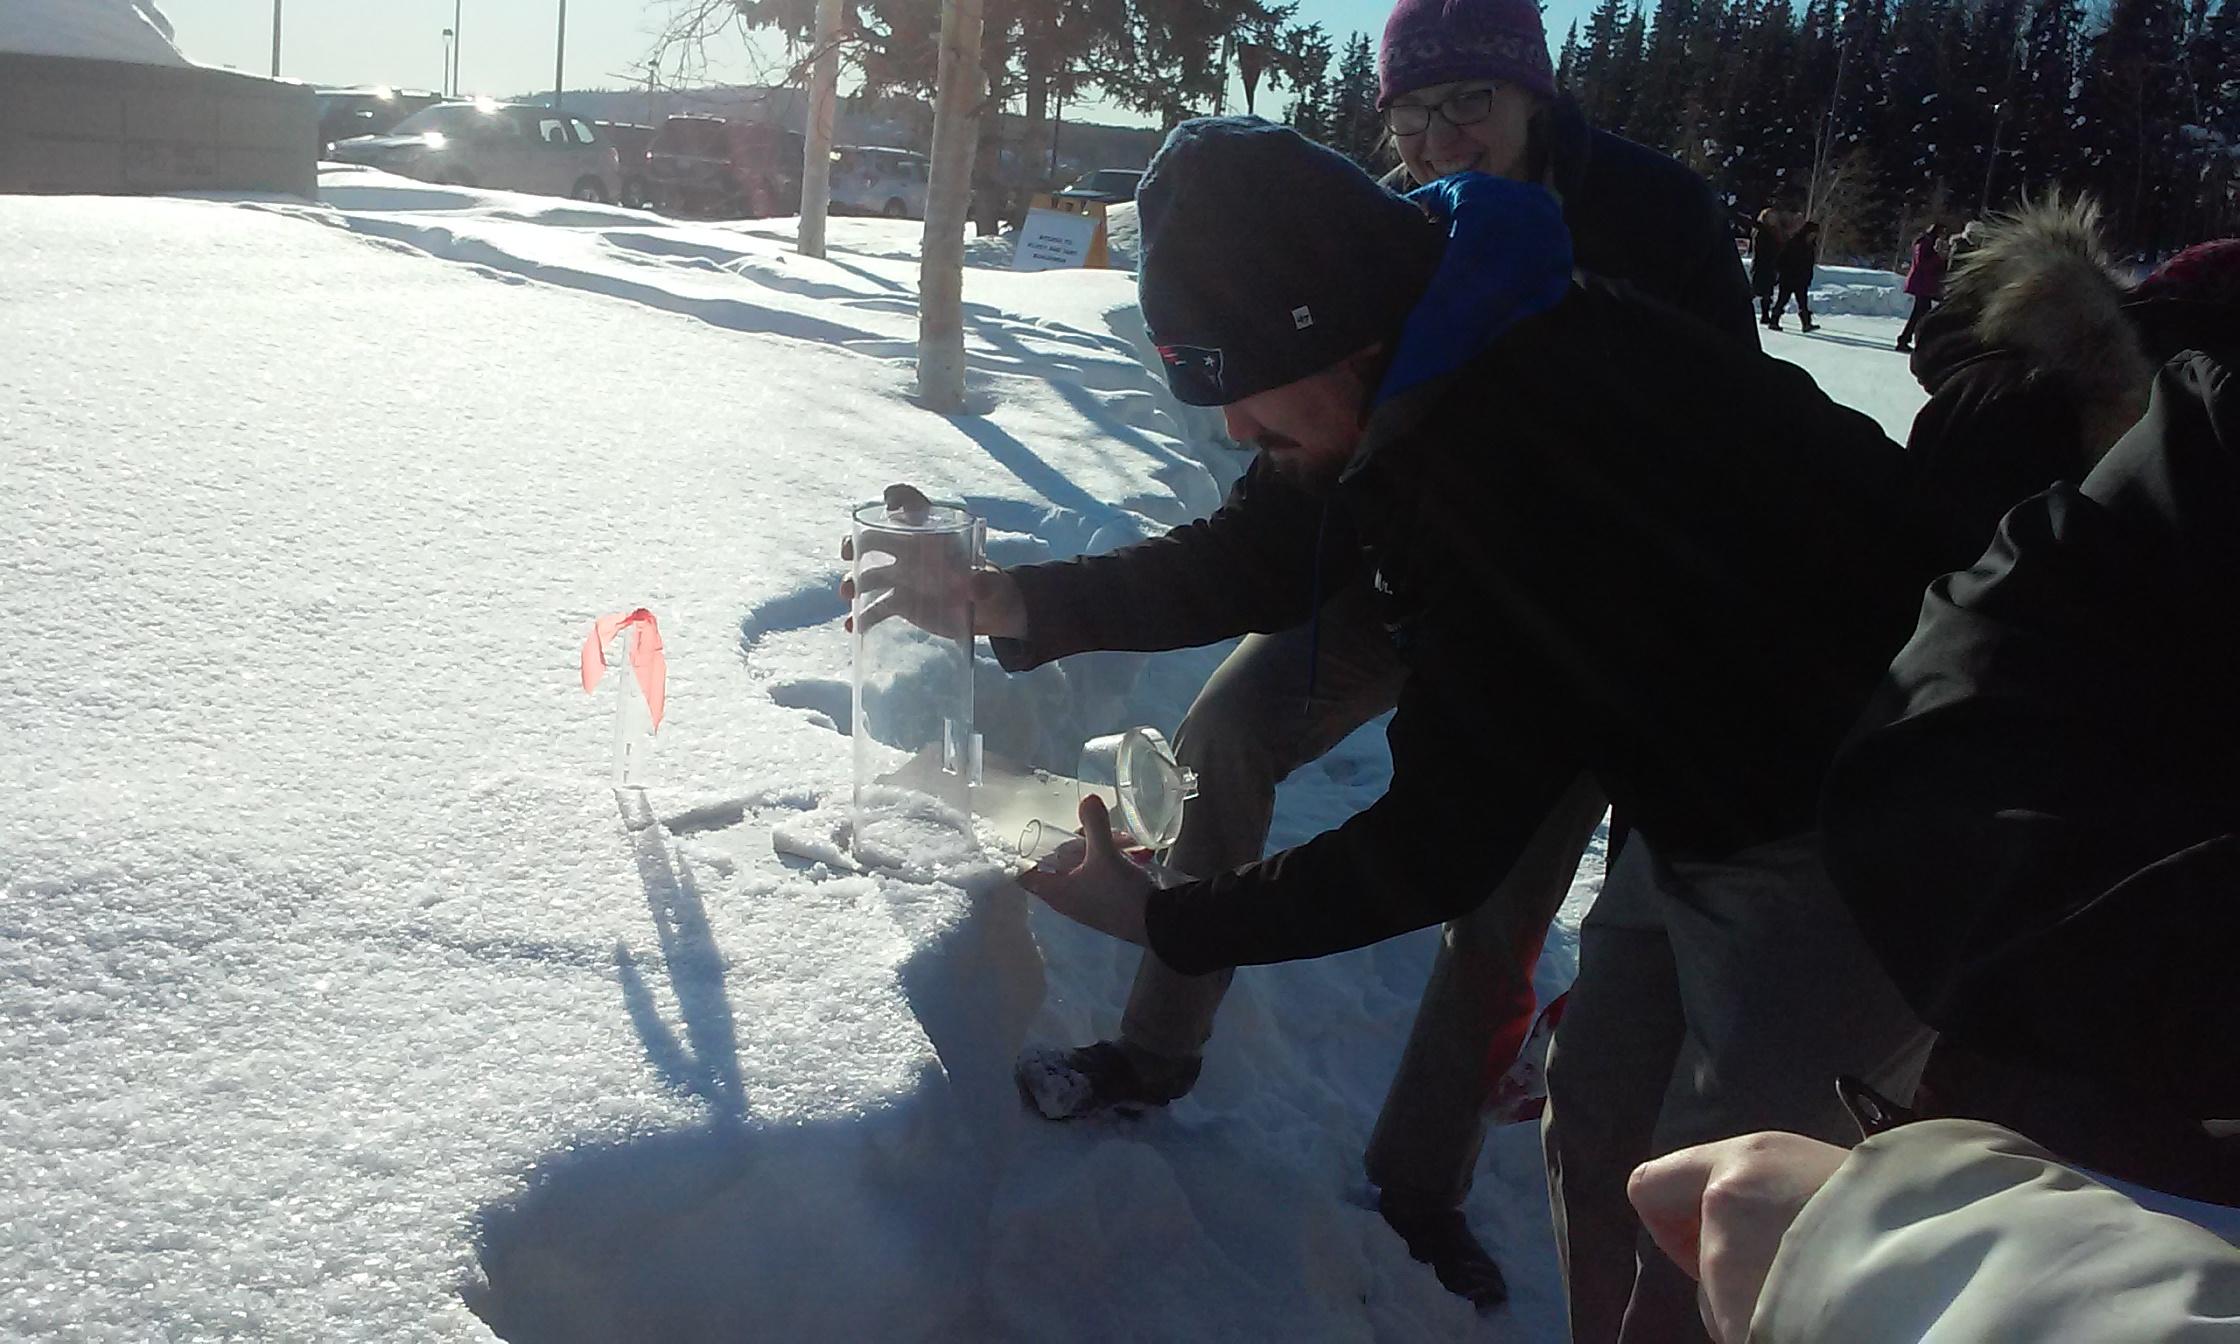 Measuring new snowfall